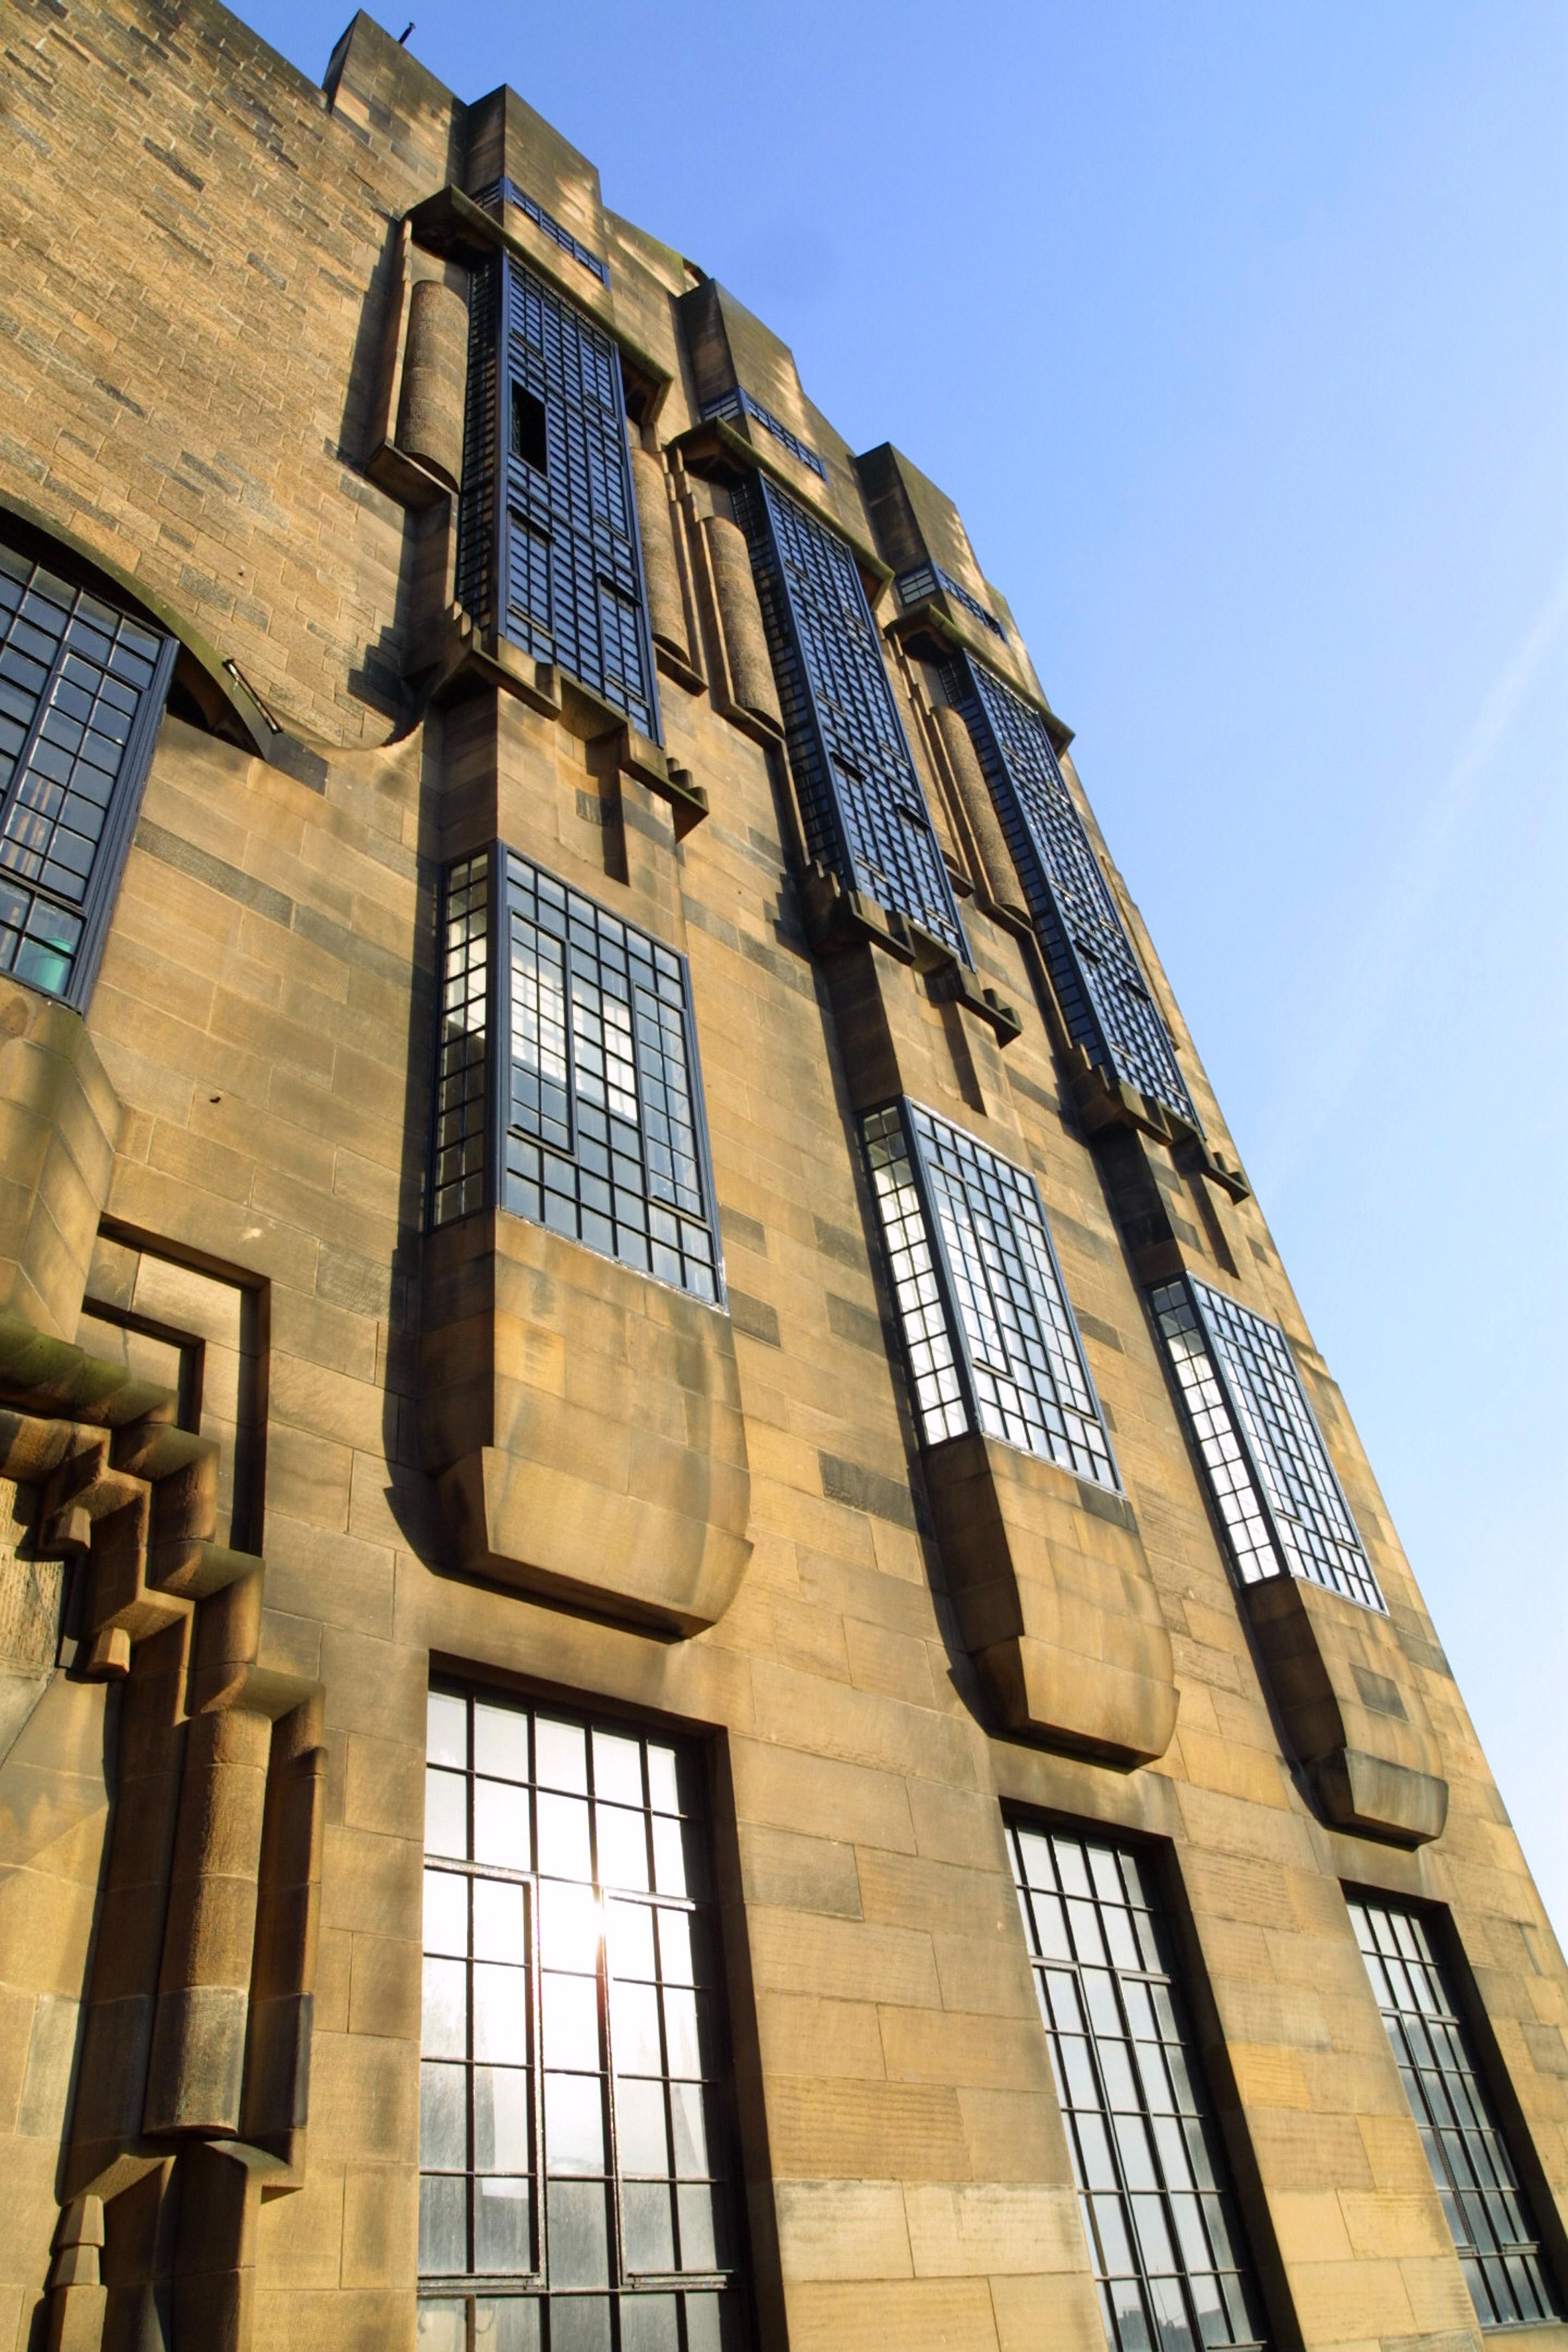 Glasgow School of Art by Charles Rennie Mackintosh